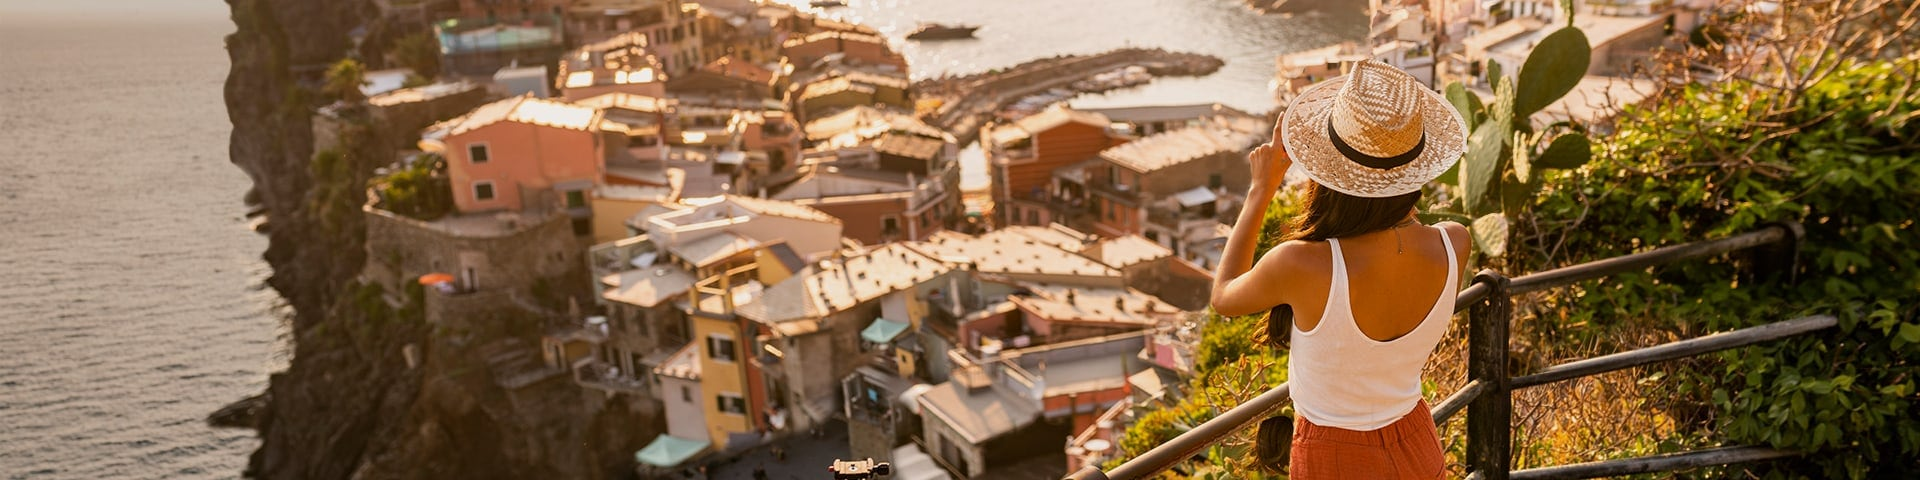 Tourist making a photo of Vernazza